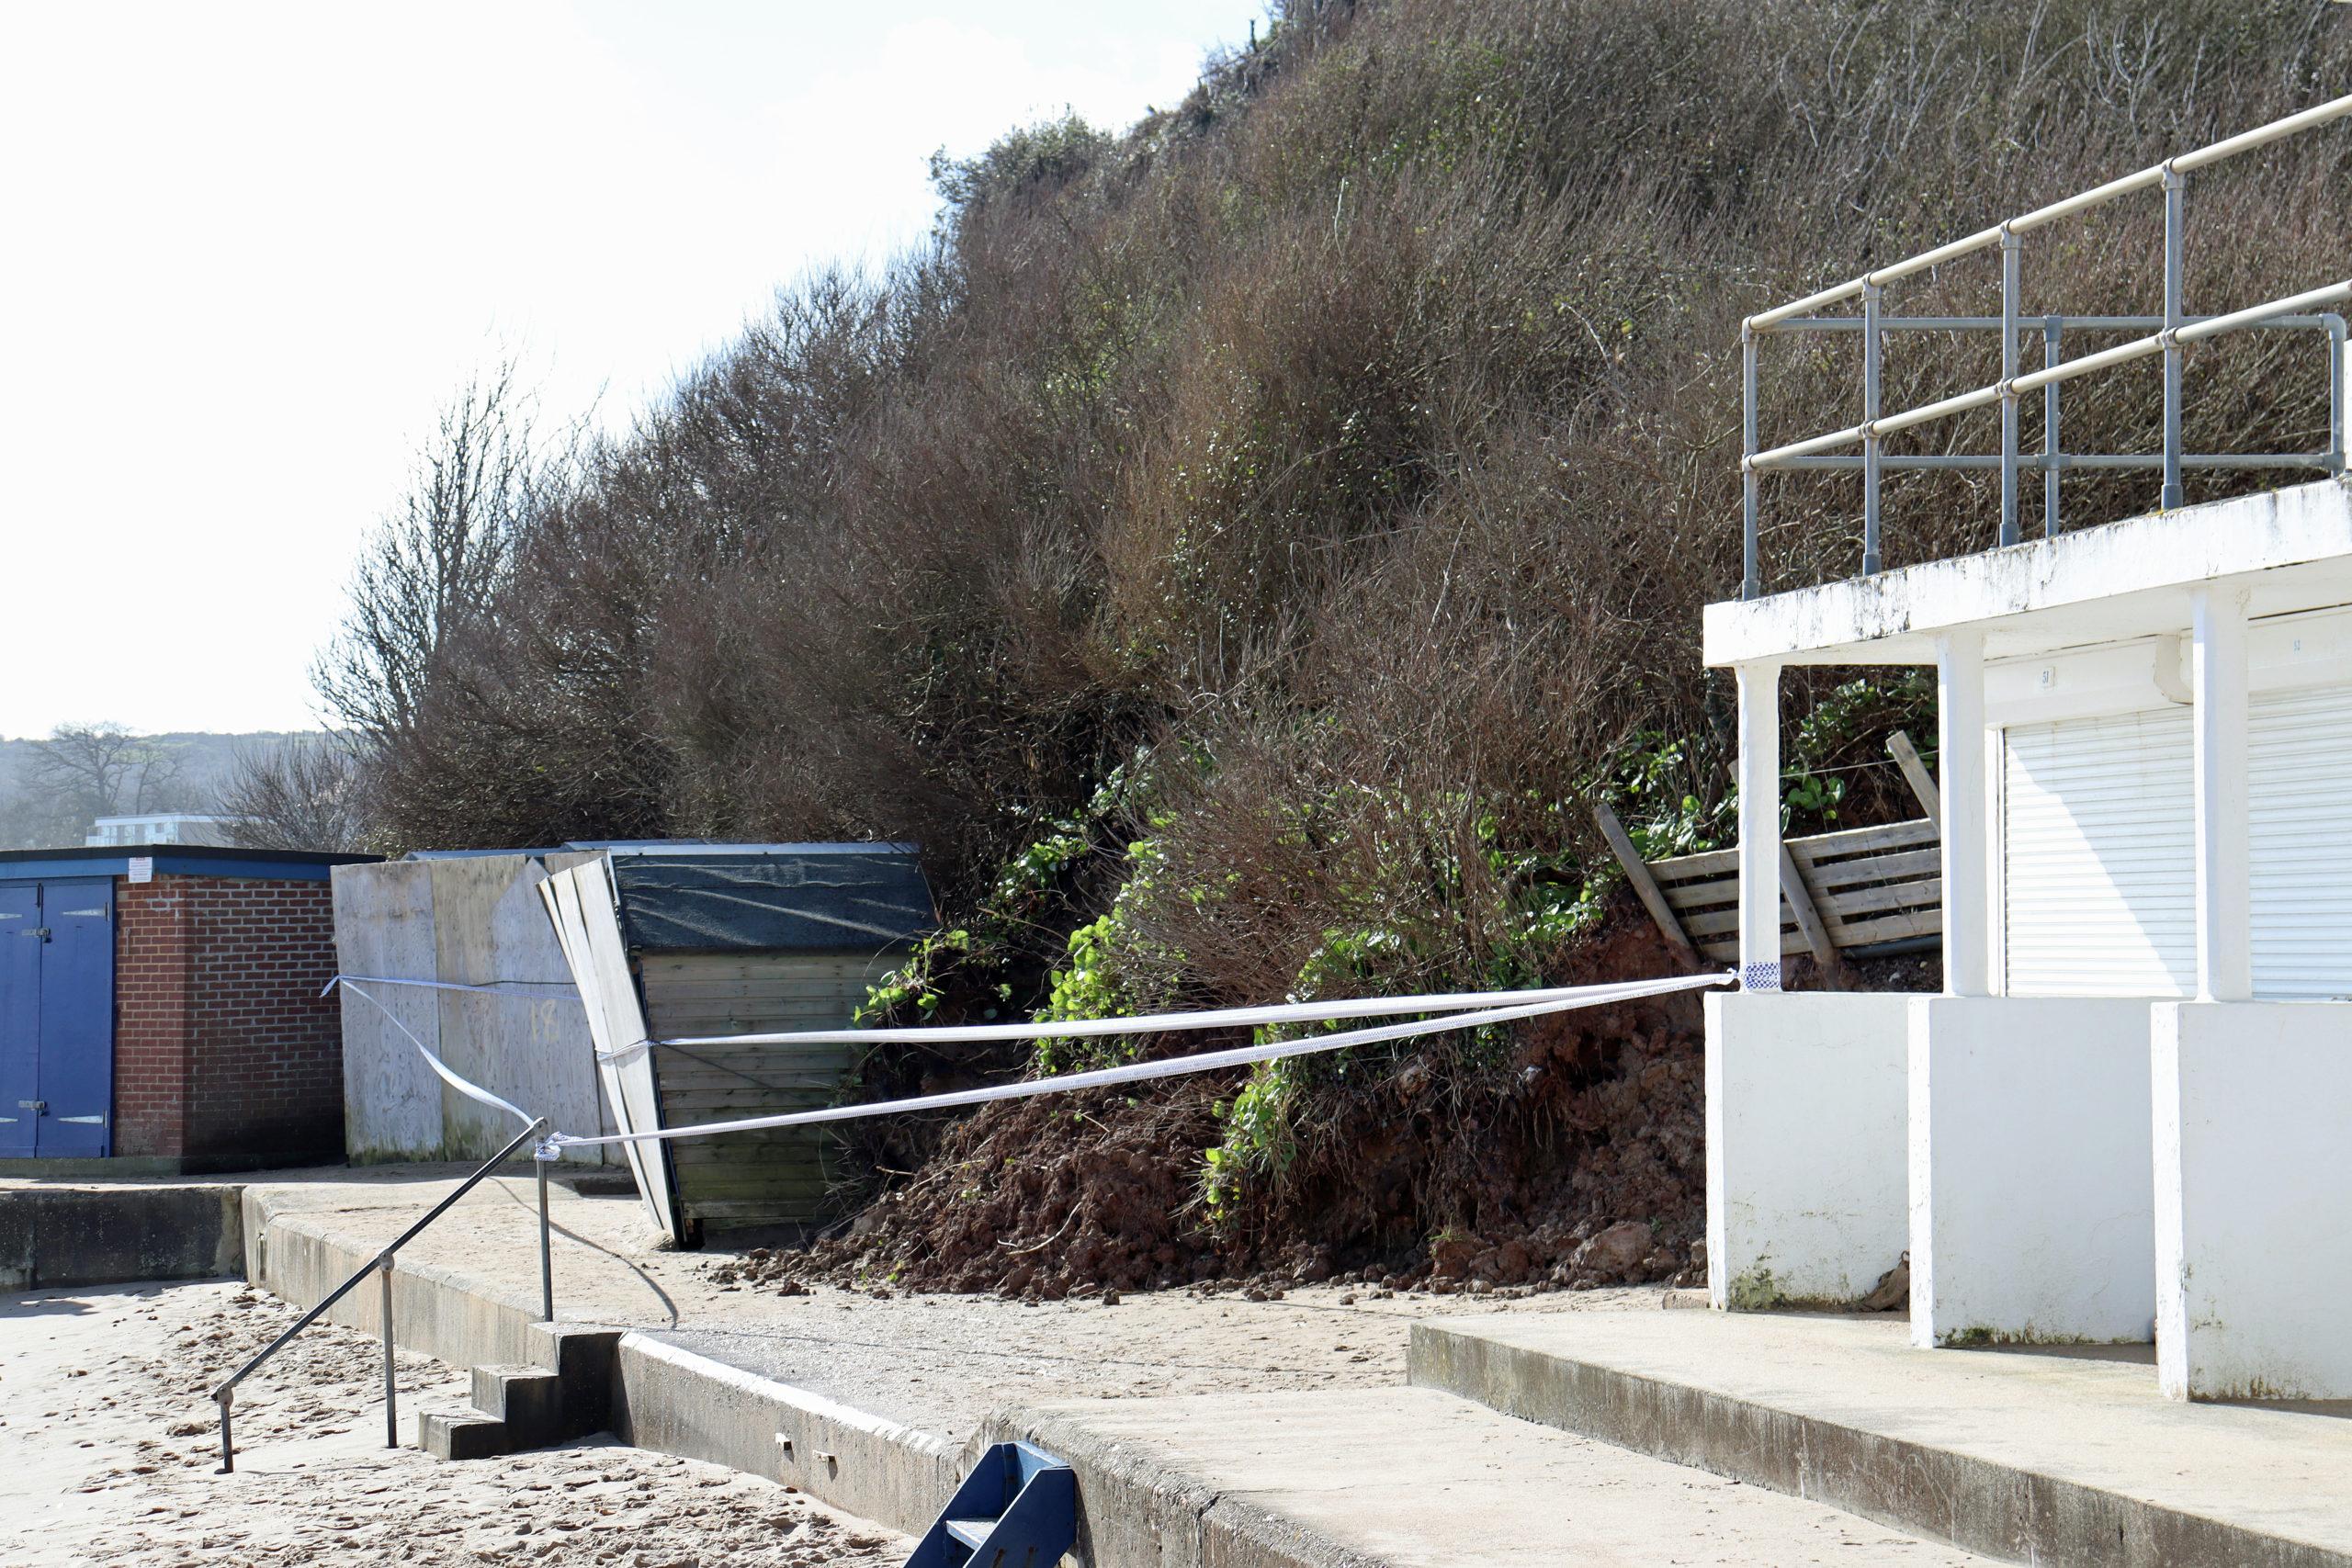 Beach huts damaged by landslip